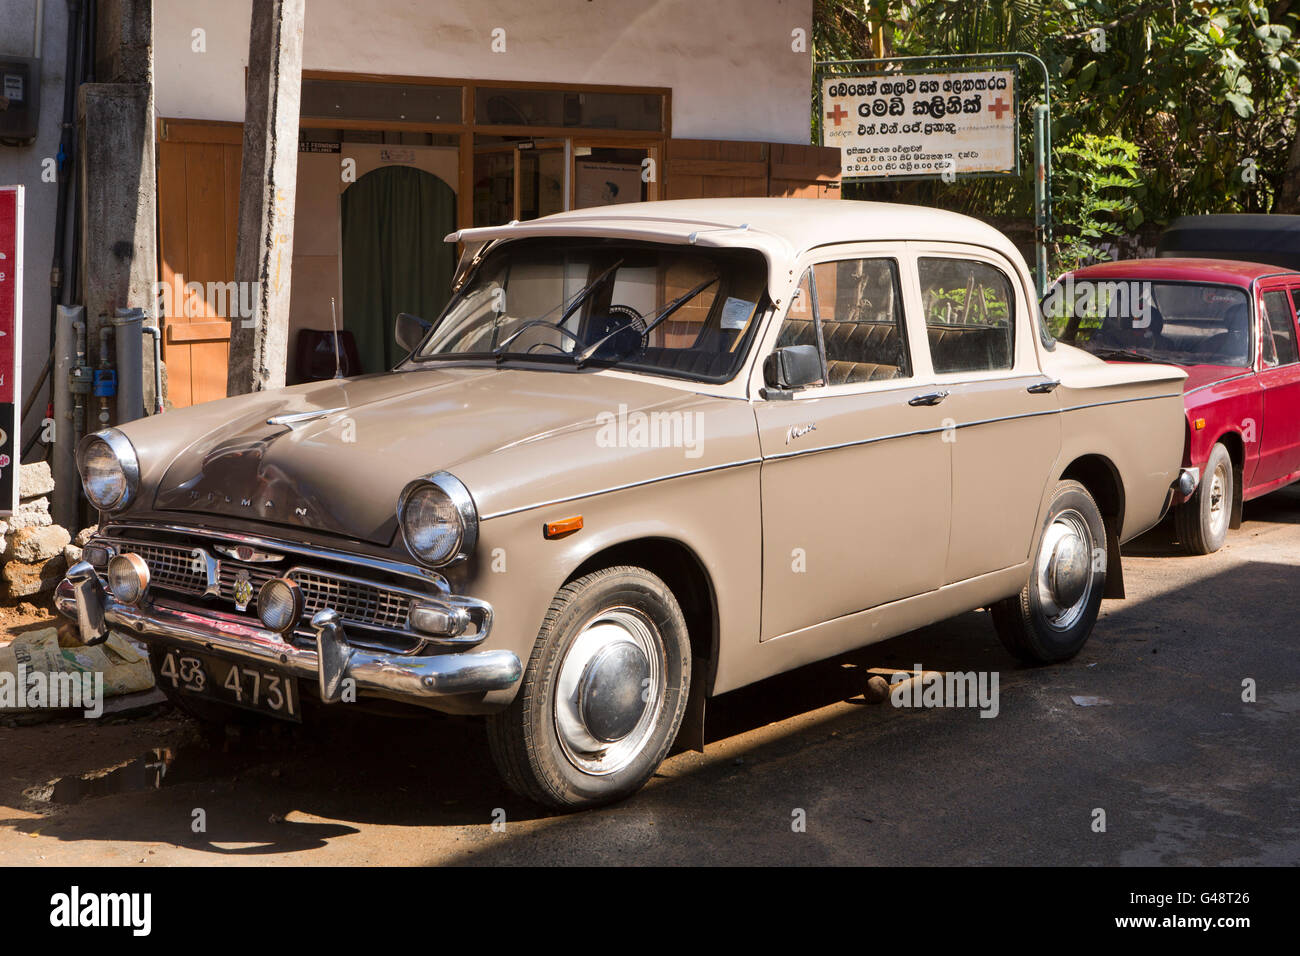 Sri Lanka Mirissa 1960s British Made Hillman Minx Car Stock